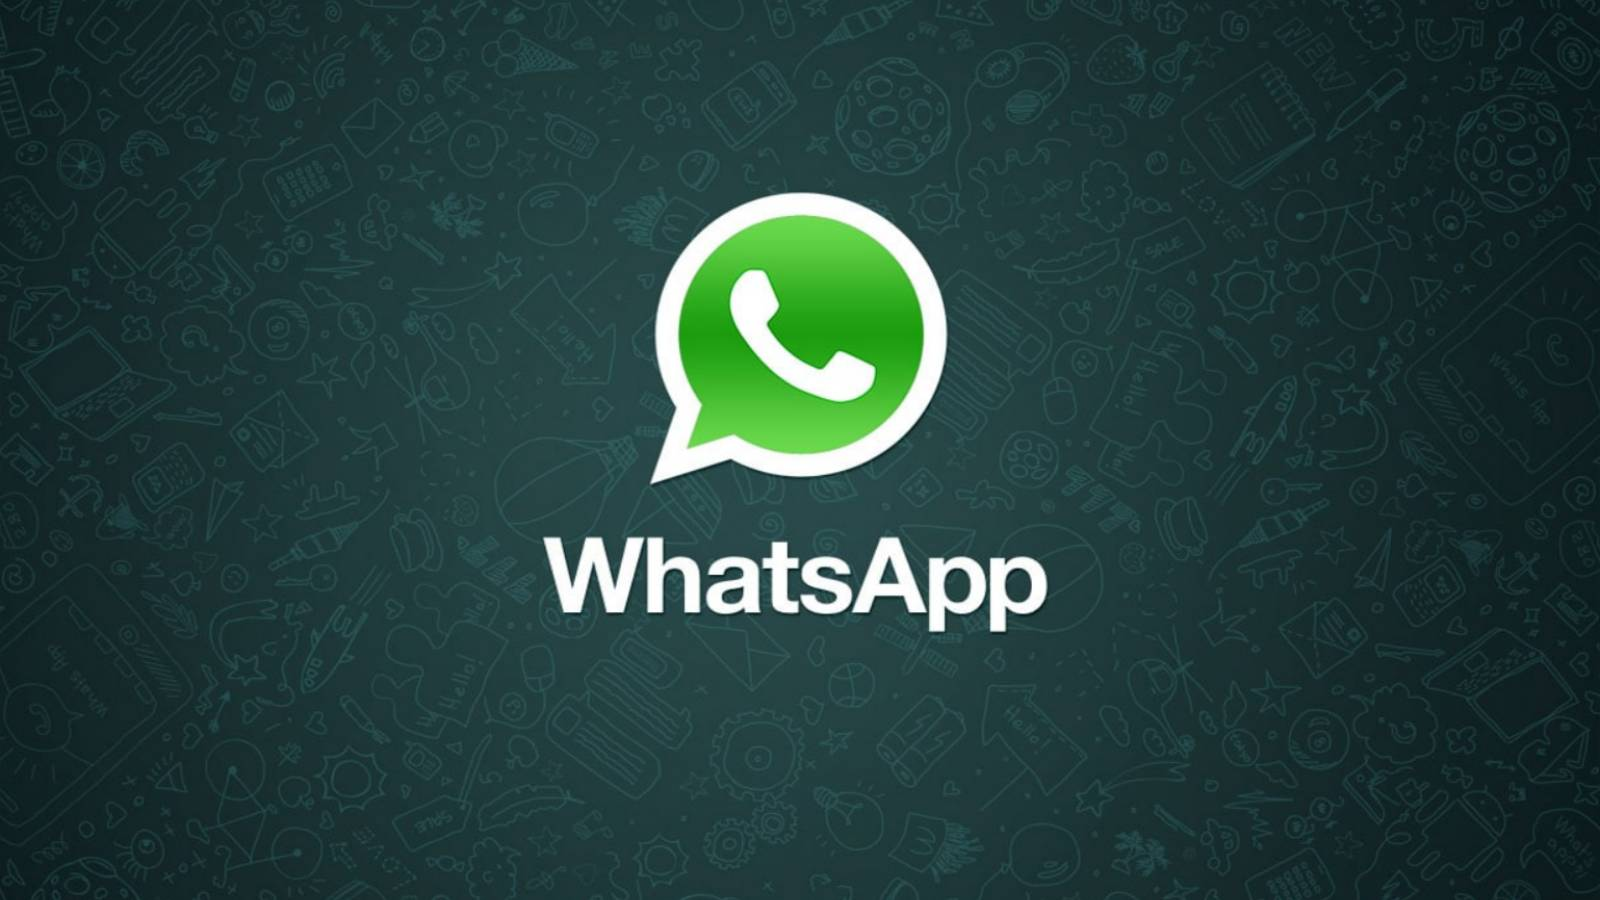 WhatsApp fundal